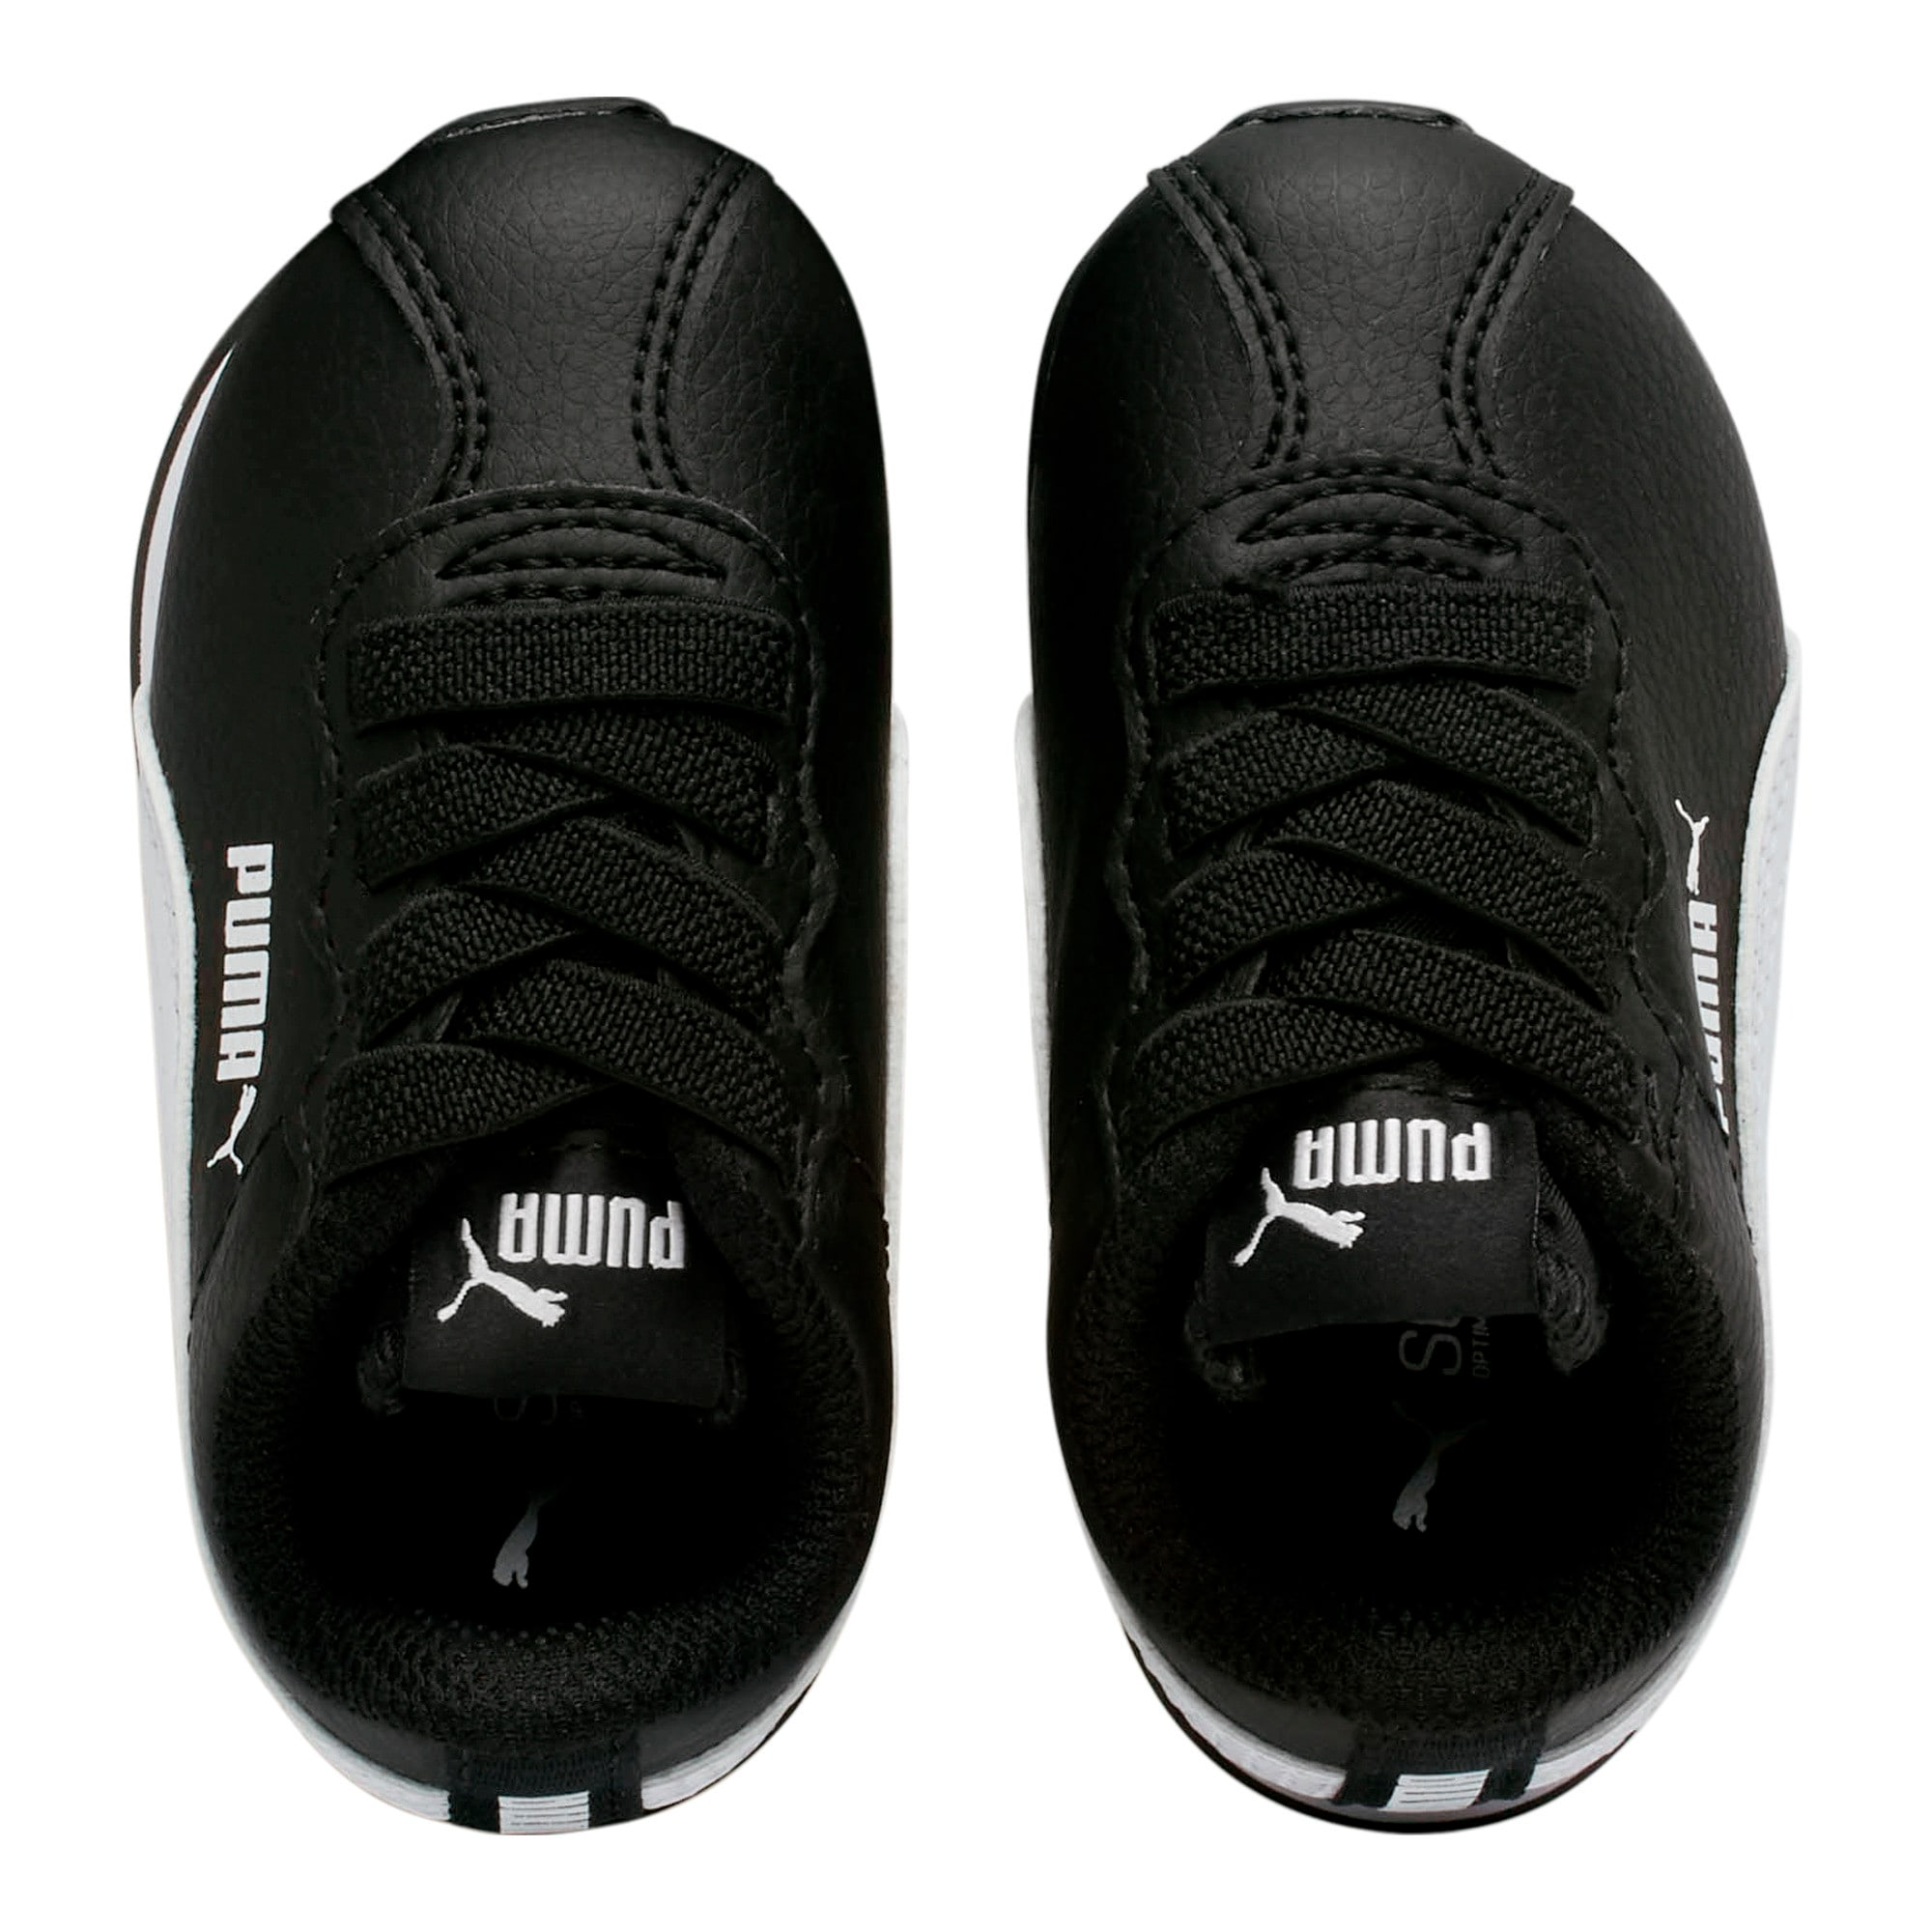 Thumbnail 6 of Turin II AC Toddler Shoes, Puma Black-Puma White, medium